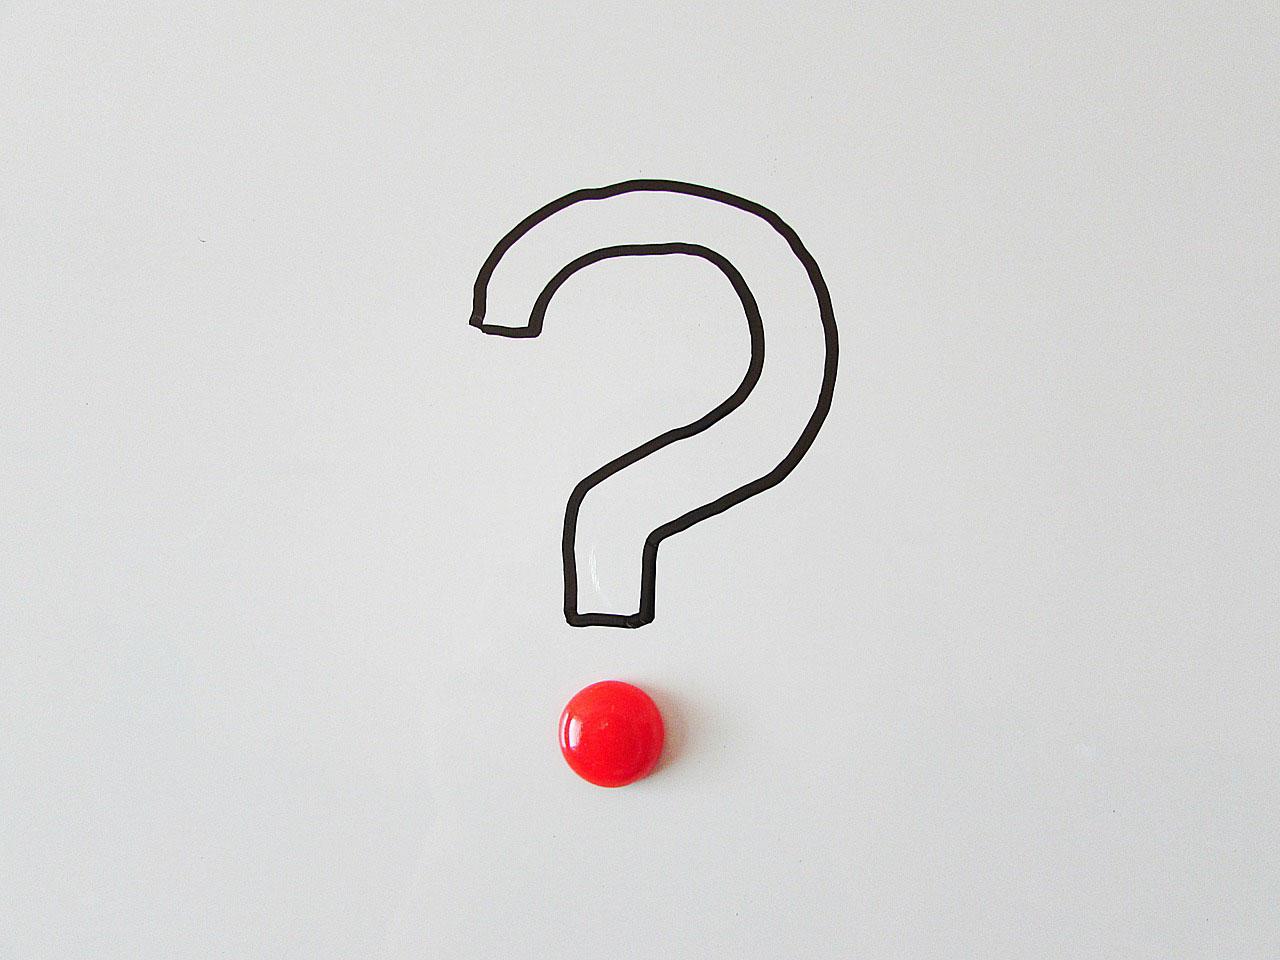 Juice FAQs